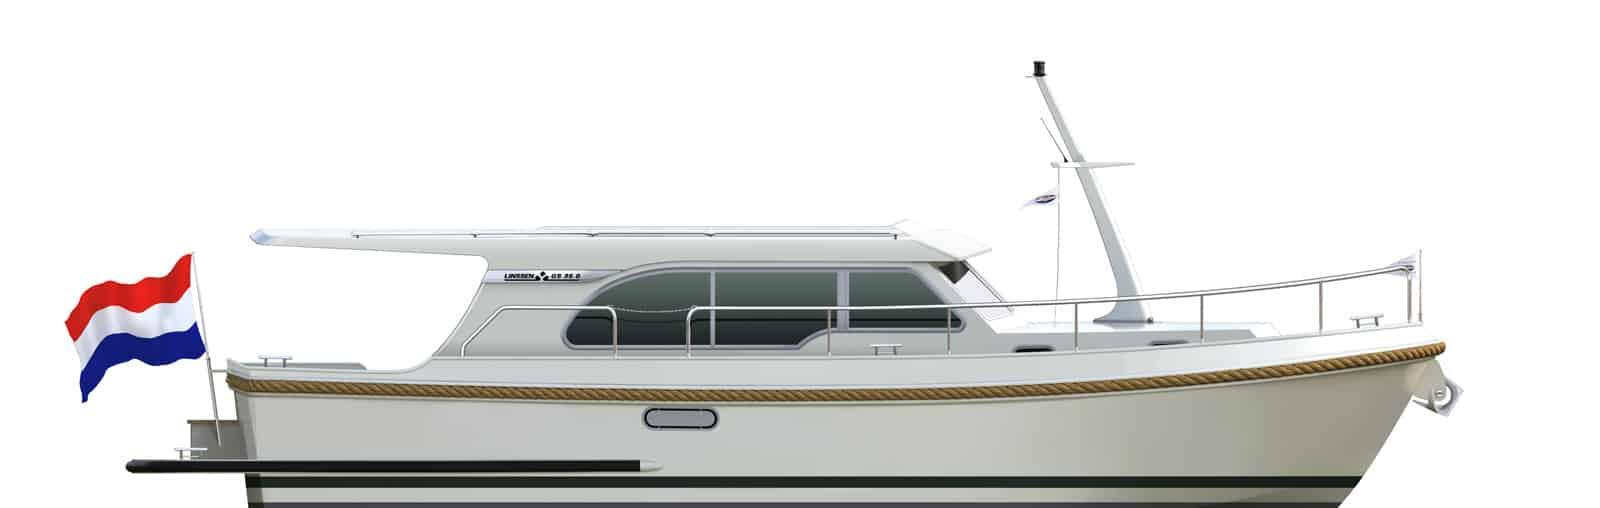 GrandSturdy35-0-Sedan_silhouet intero